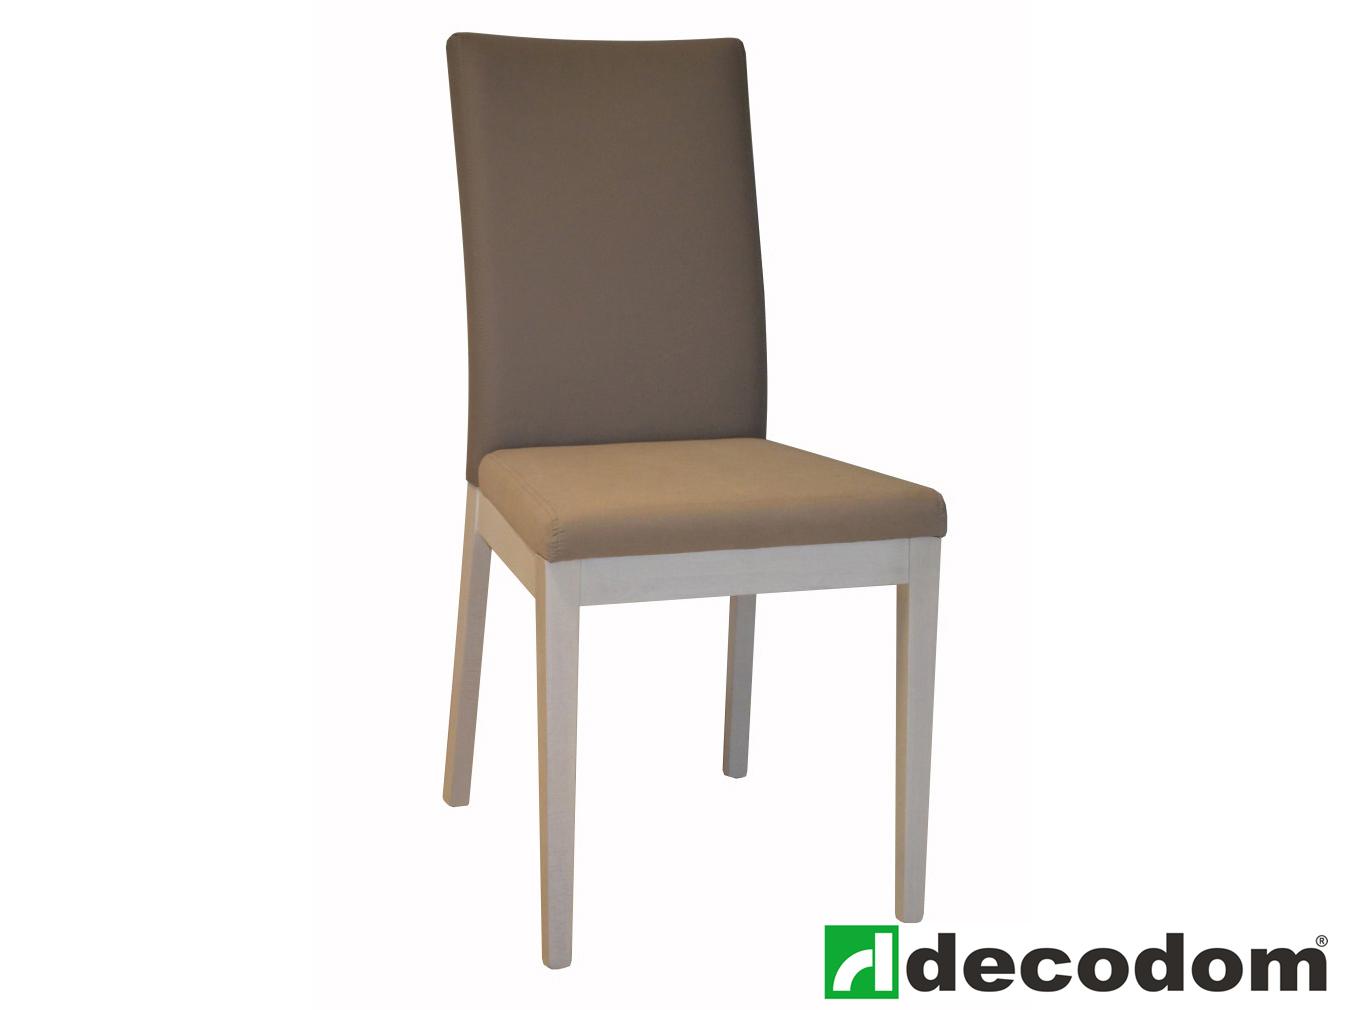 35c8def949dd Jedálenská stolička - Decodom - Venda (pino aurelio + hnedá)